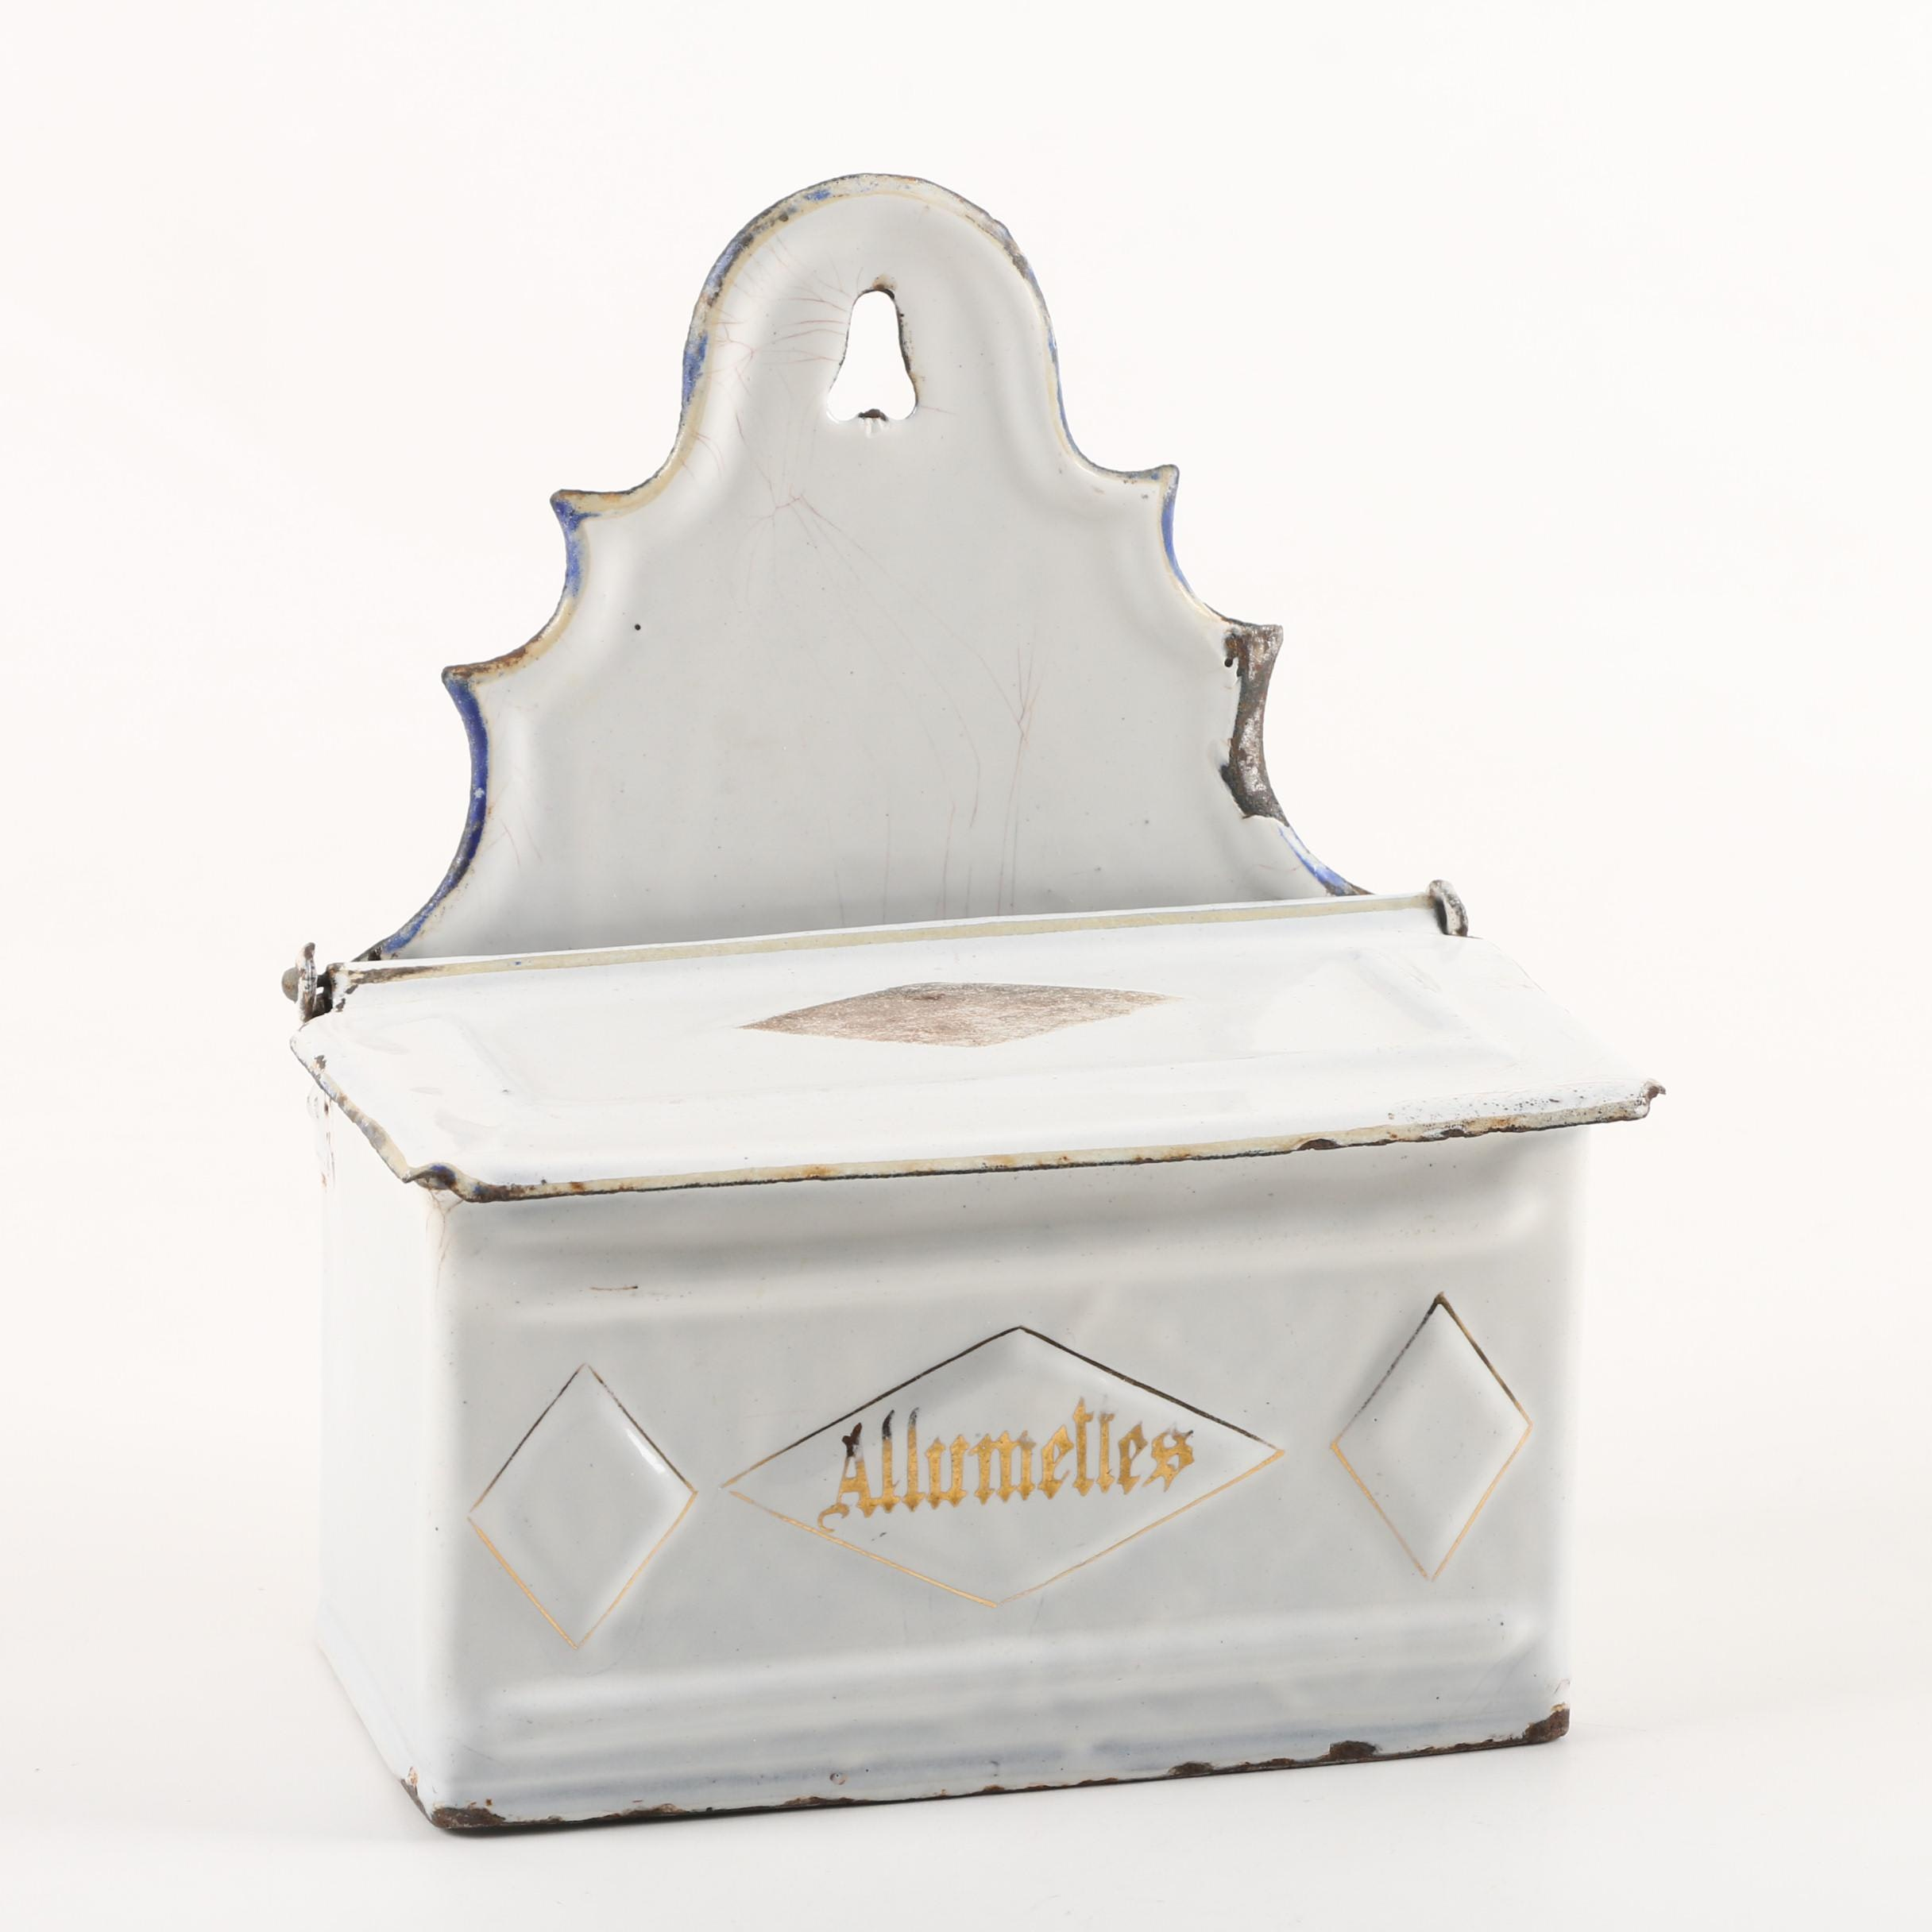 "Vintage ""Allumettes"" French White Enameled Metal Match Box"